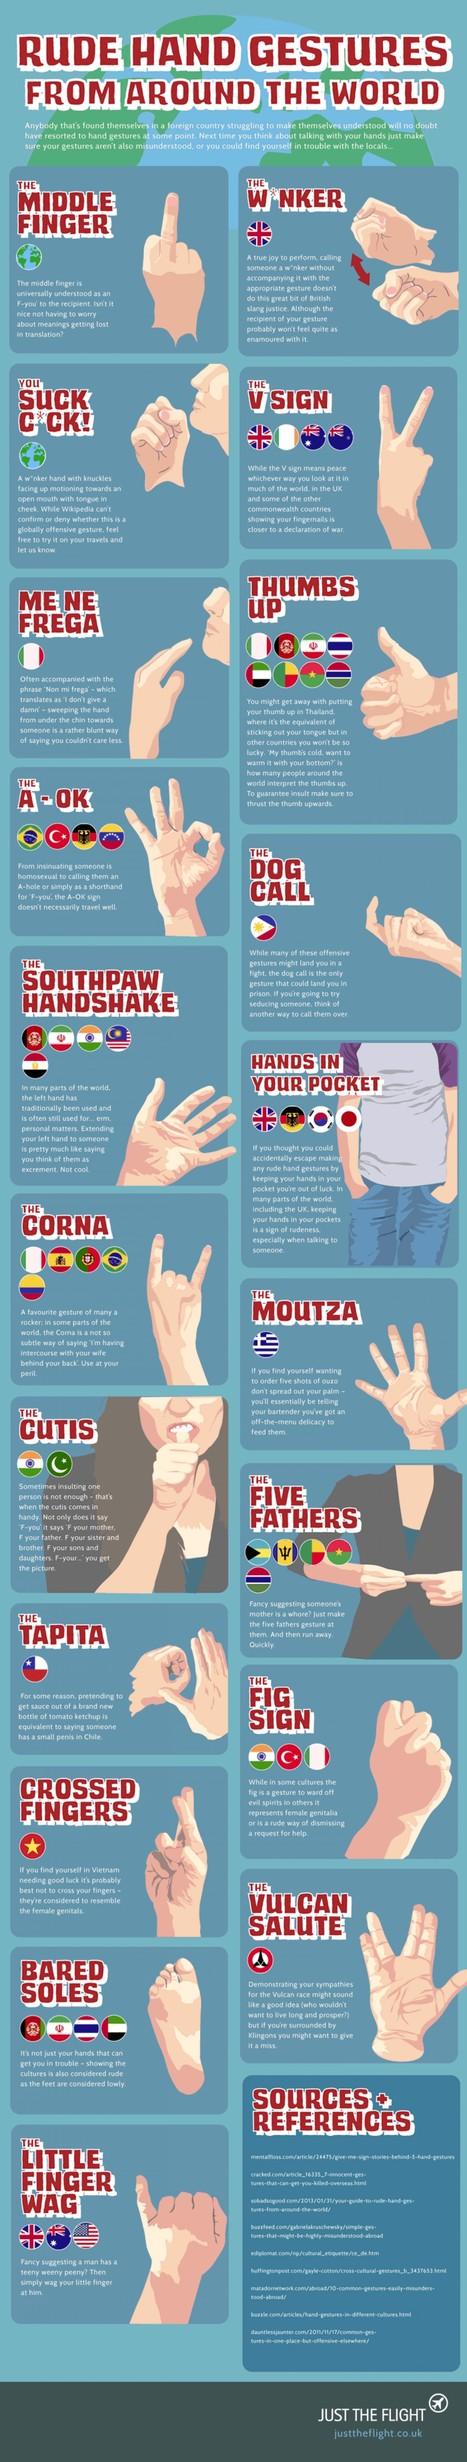 Rude hand Gestures From Around The World | Infographics | Scoop.it